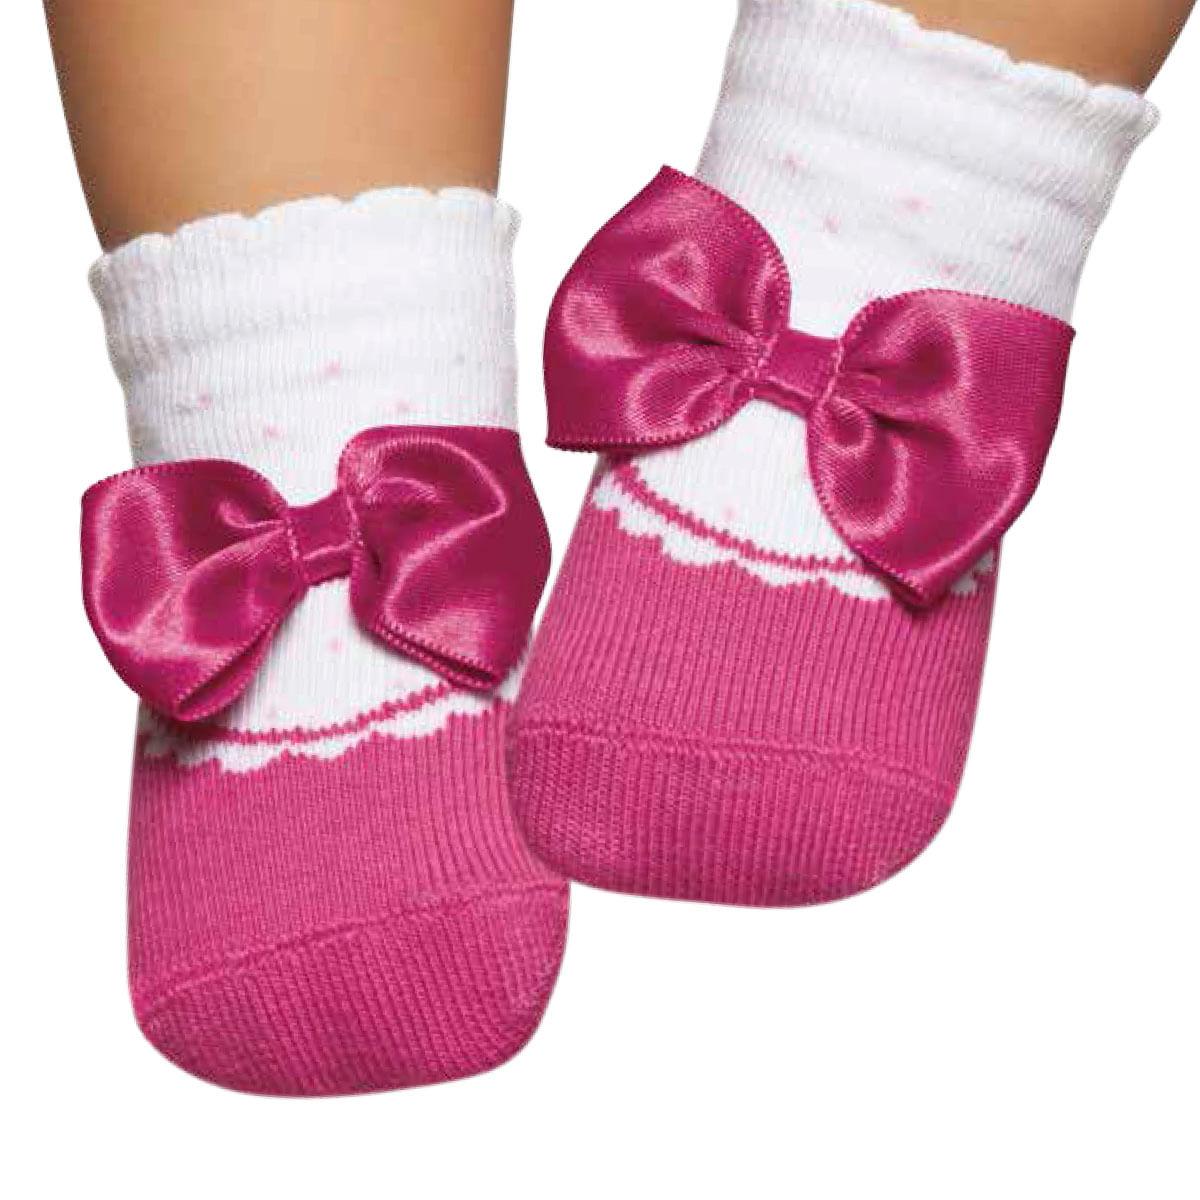 9d626ad907 Meia Soquete para bebê Laço Pink - Puket - bebefacil